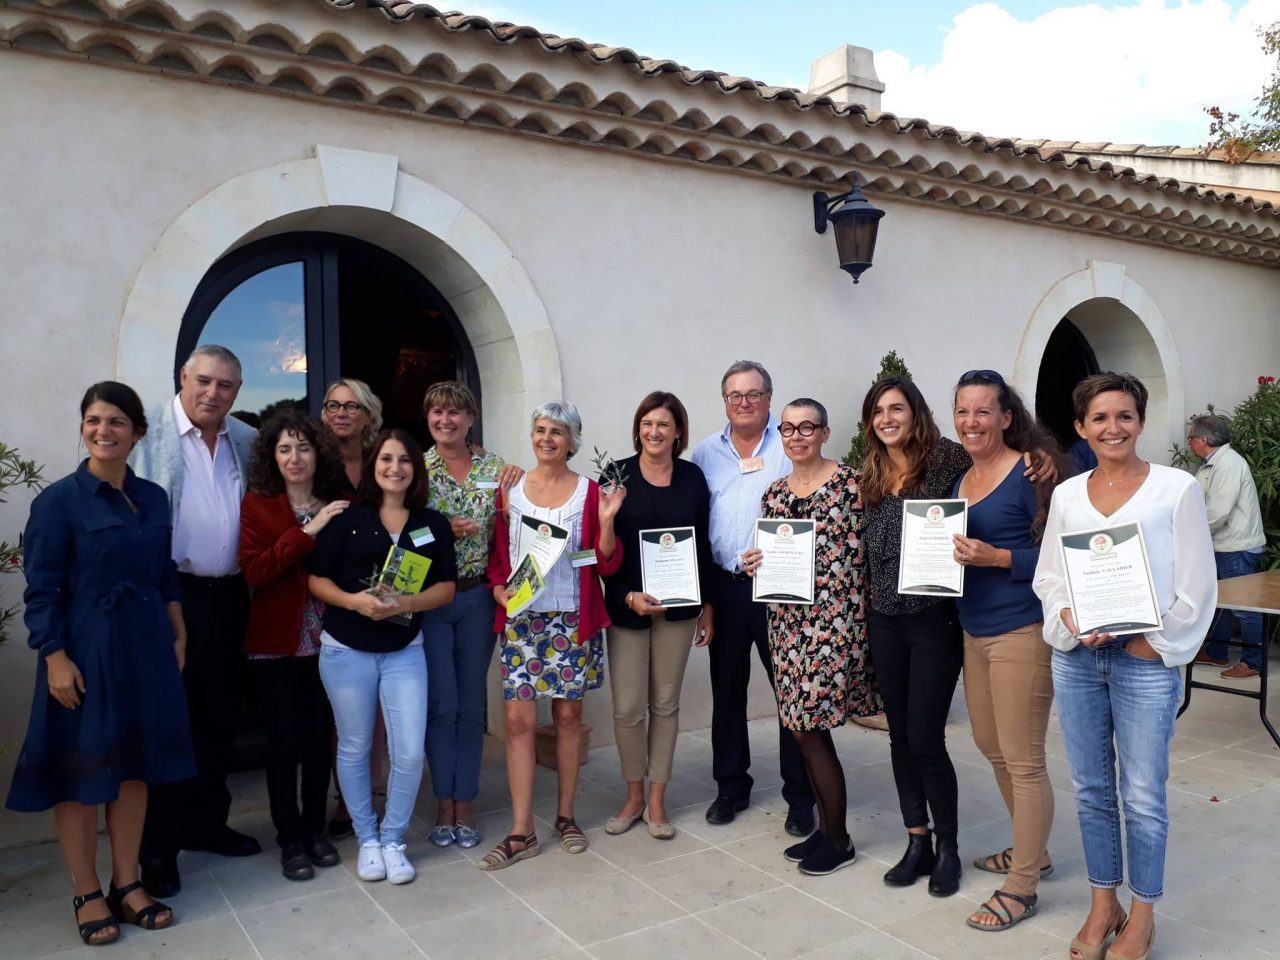 championnat dégustation huile d'olive 2017 France